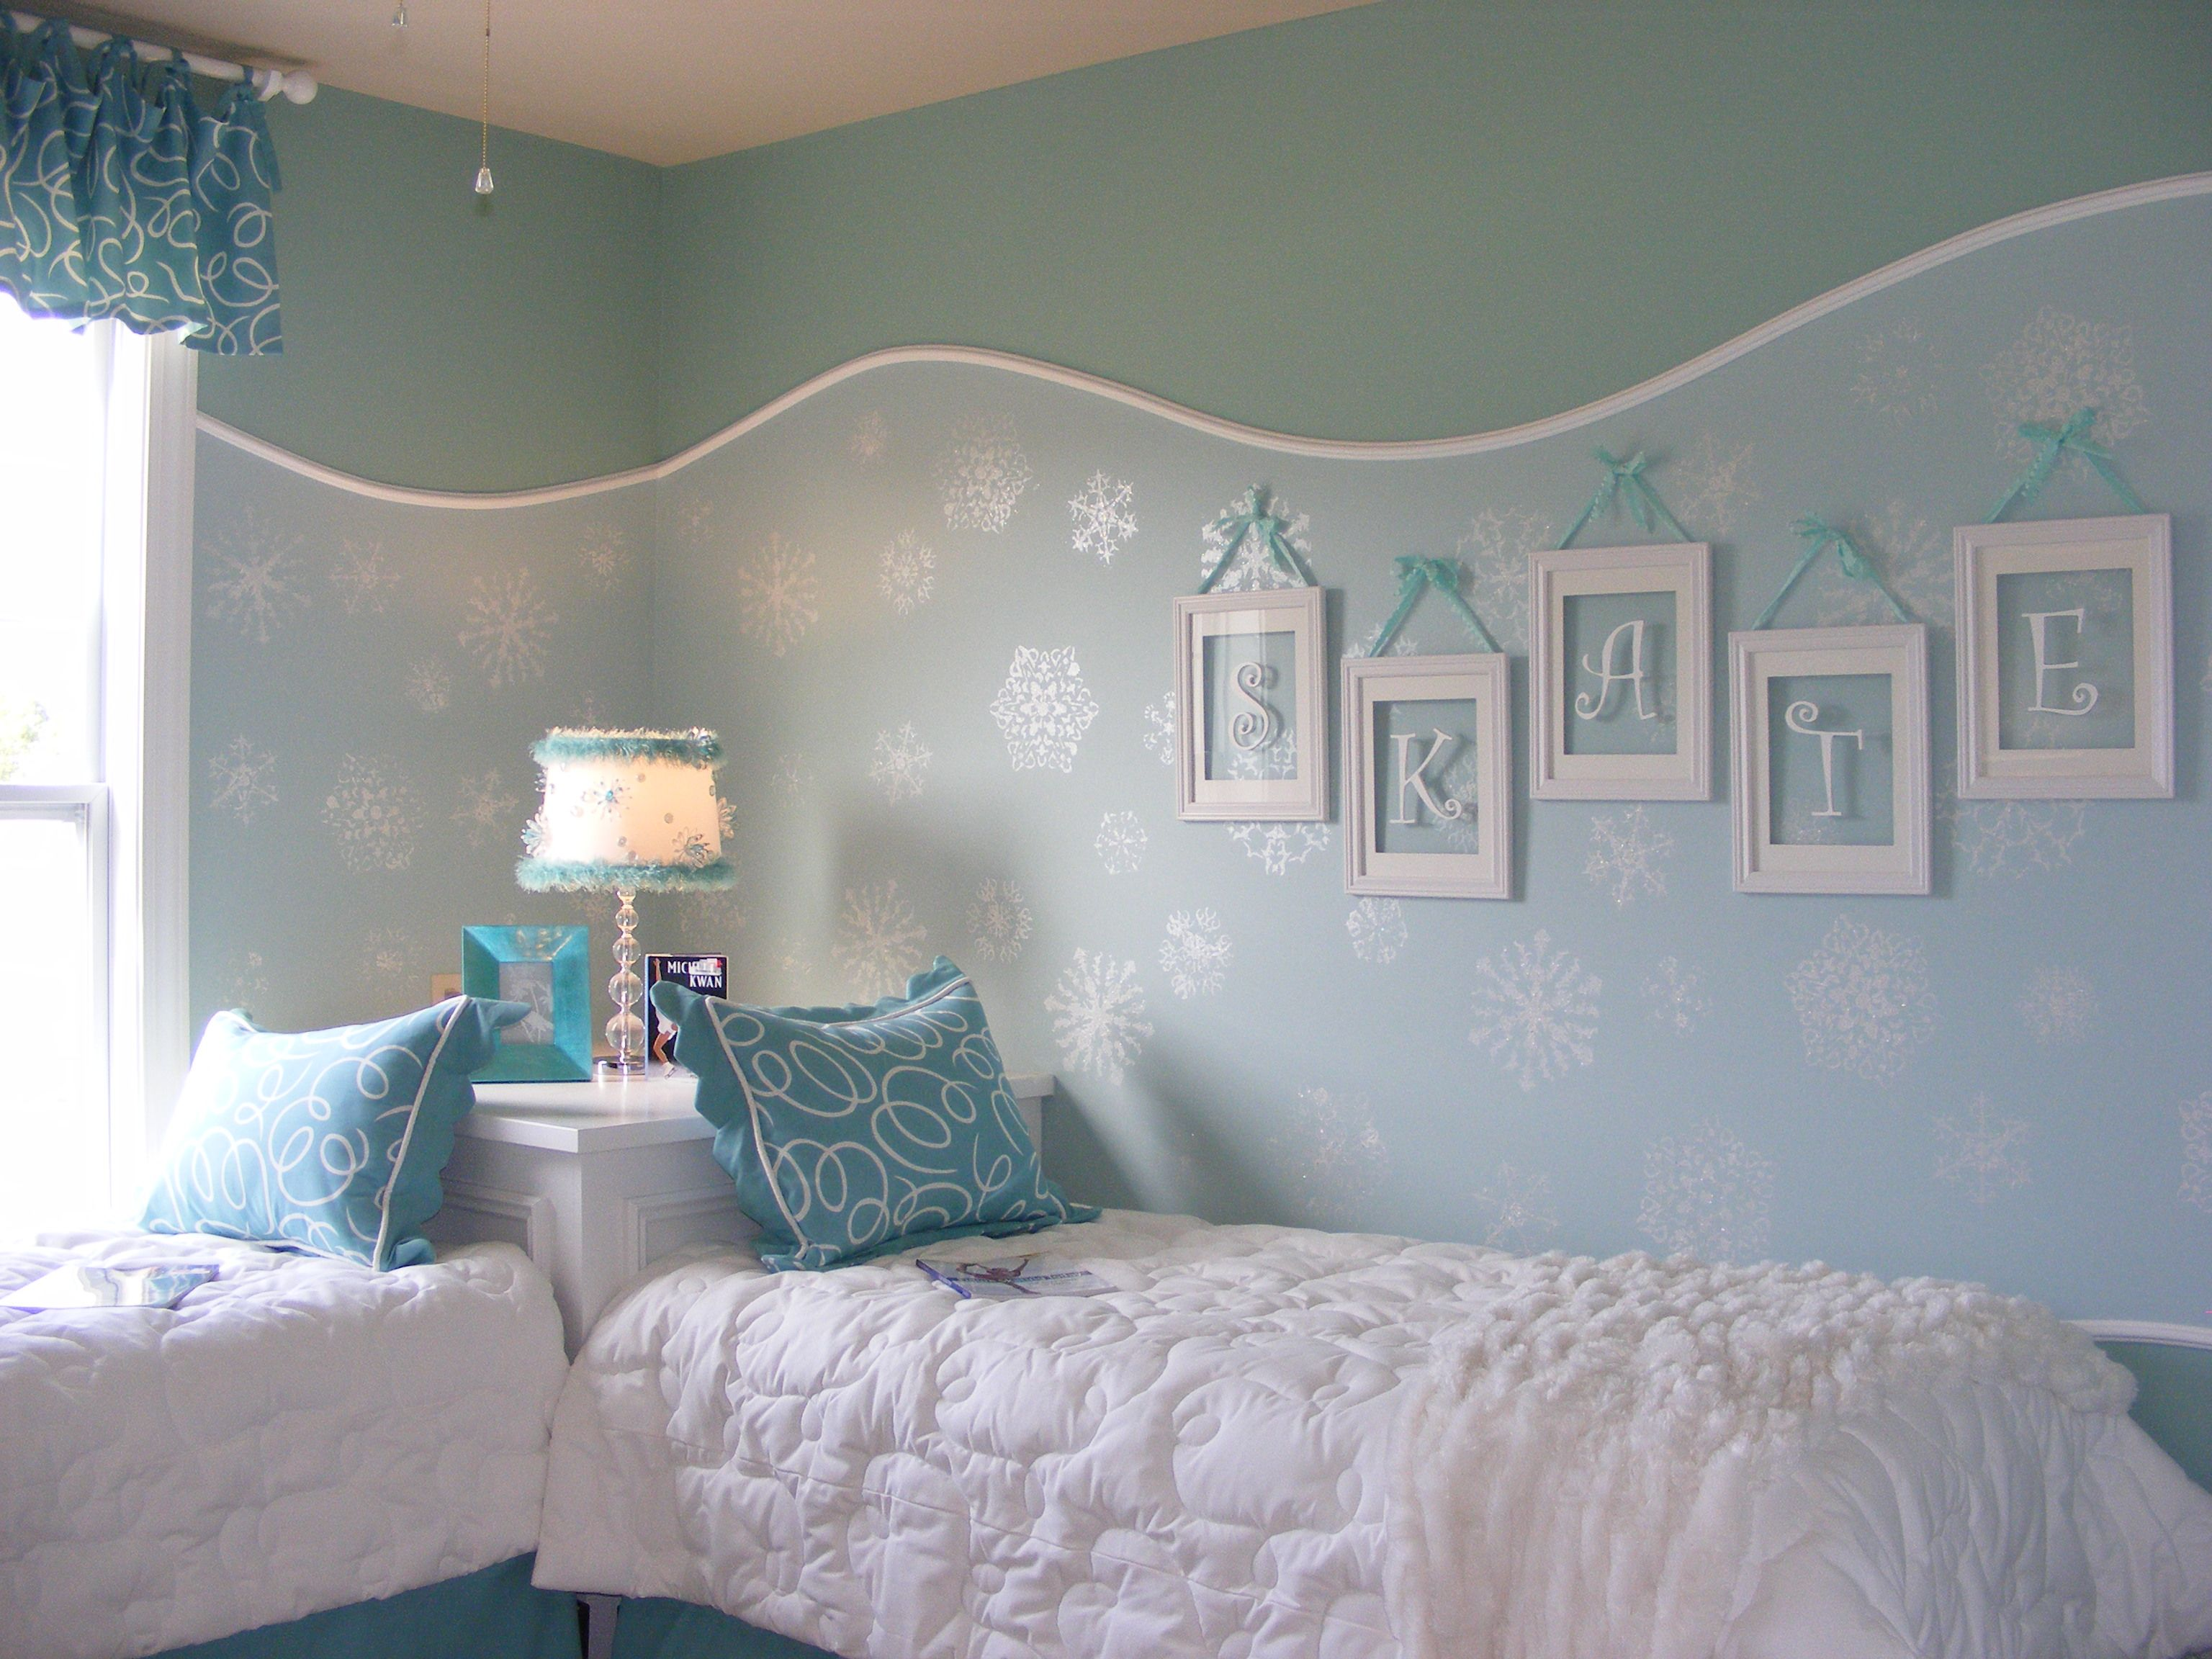 Frozen theme Elsa bedroom - Elsa theme bedroom ideas - princess Disney  Frozen - Winter theme decorations - Frozen room decorating ideas - Disney  Frozen ...